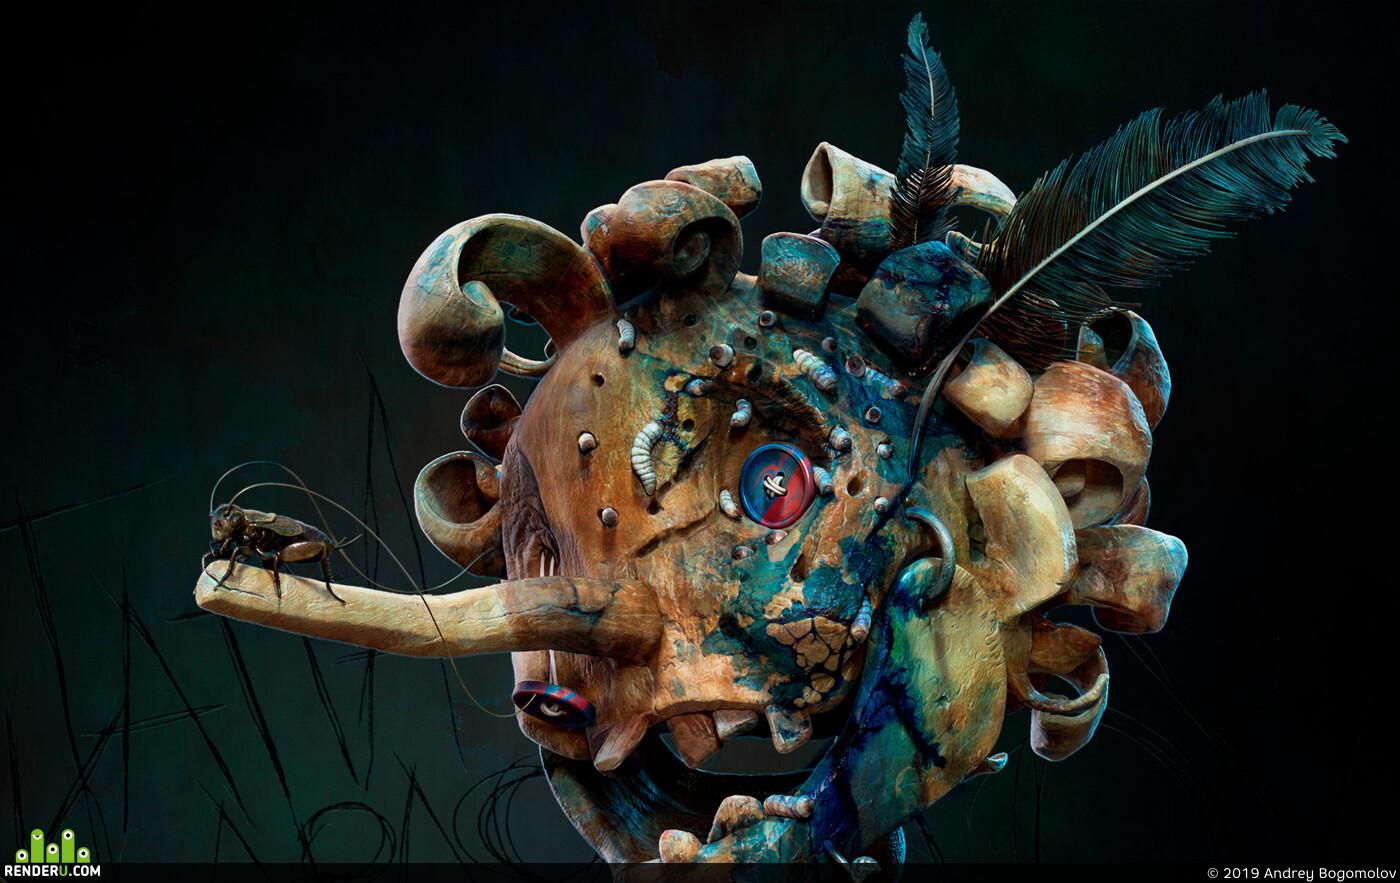 characterart, characterdesign, zbrushcharacter, sculpt, cgsculpt, Digital_Sculpture, 3d